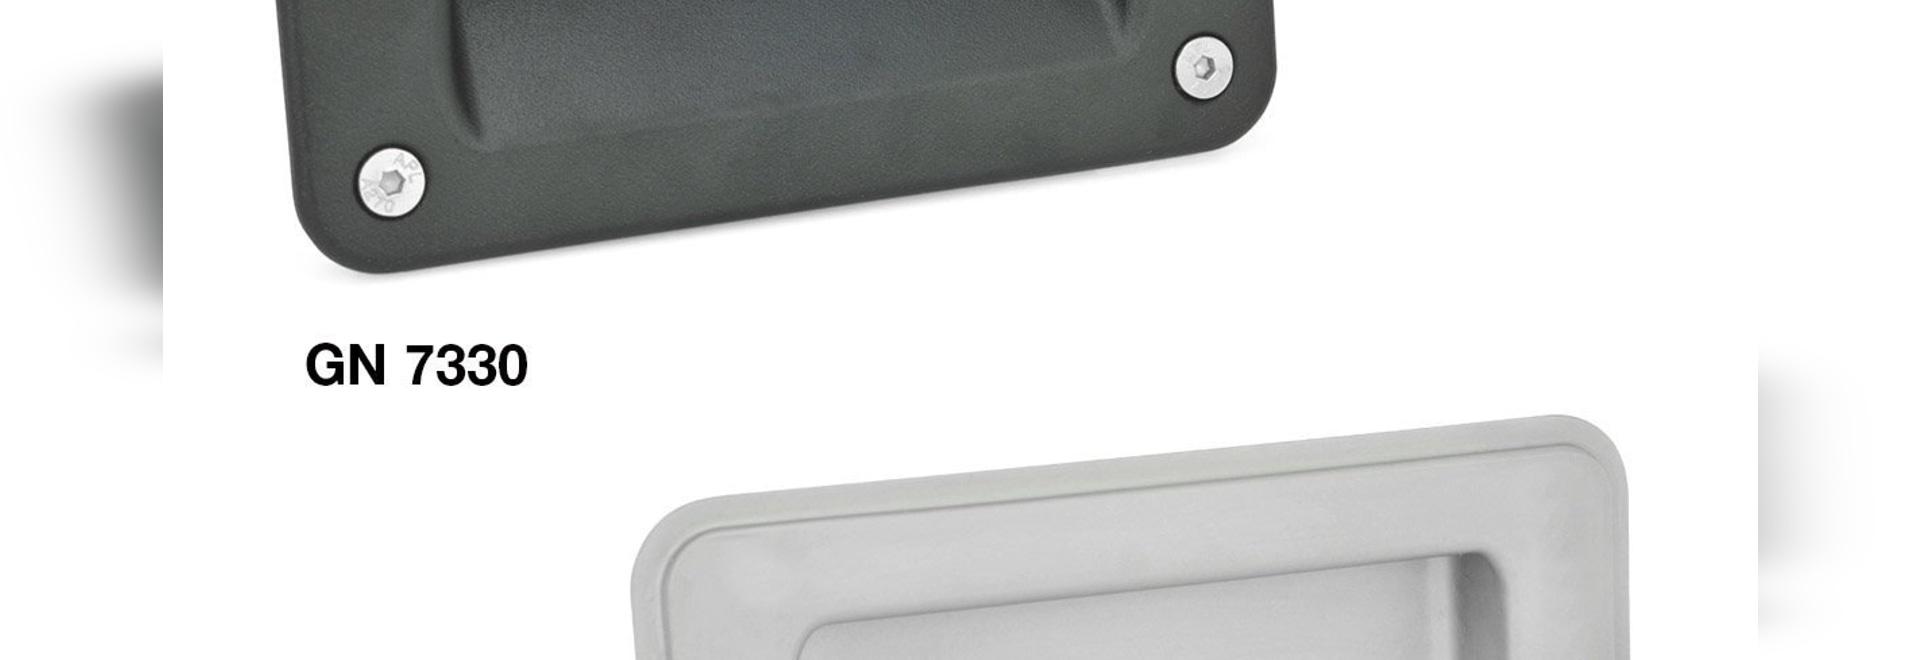 JW Winco's gripping trays